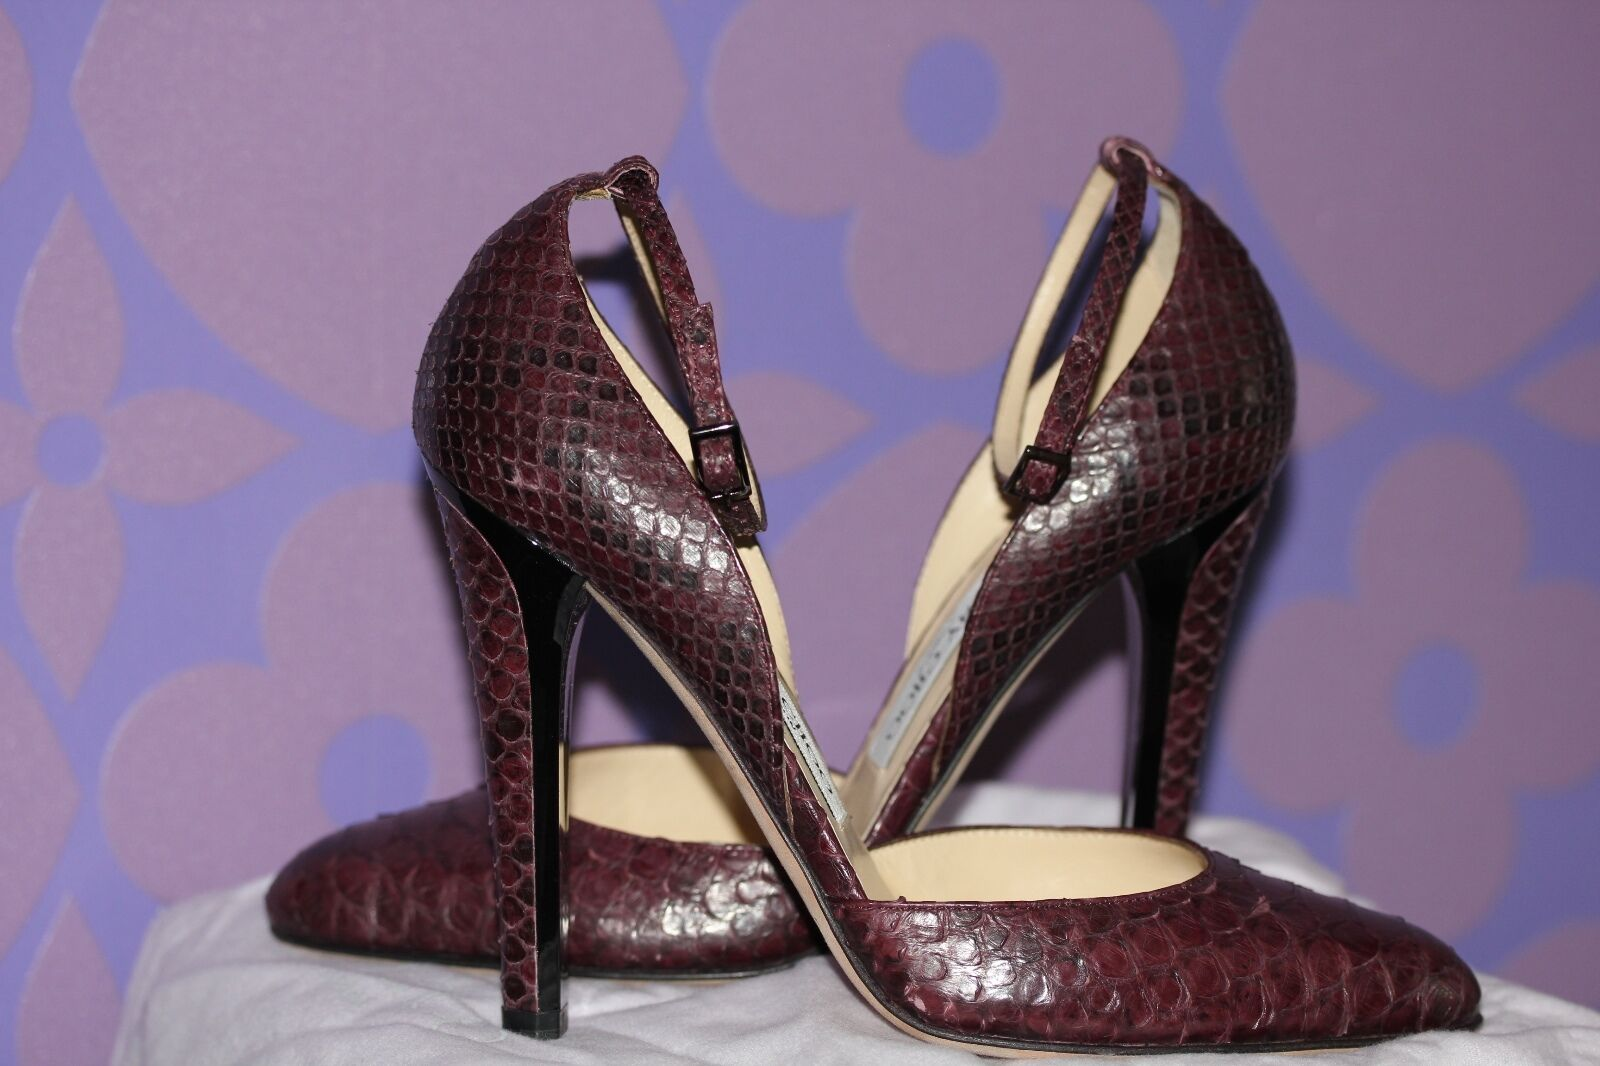 JIMMY CHOO Python Snakeskin Mary Jane Bordeaux Nice Holiday Heels Limited  1k+